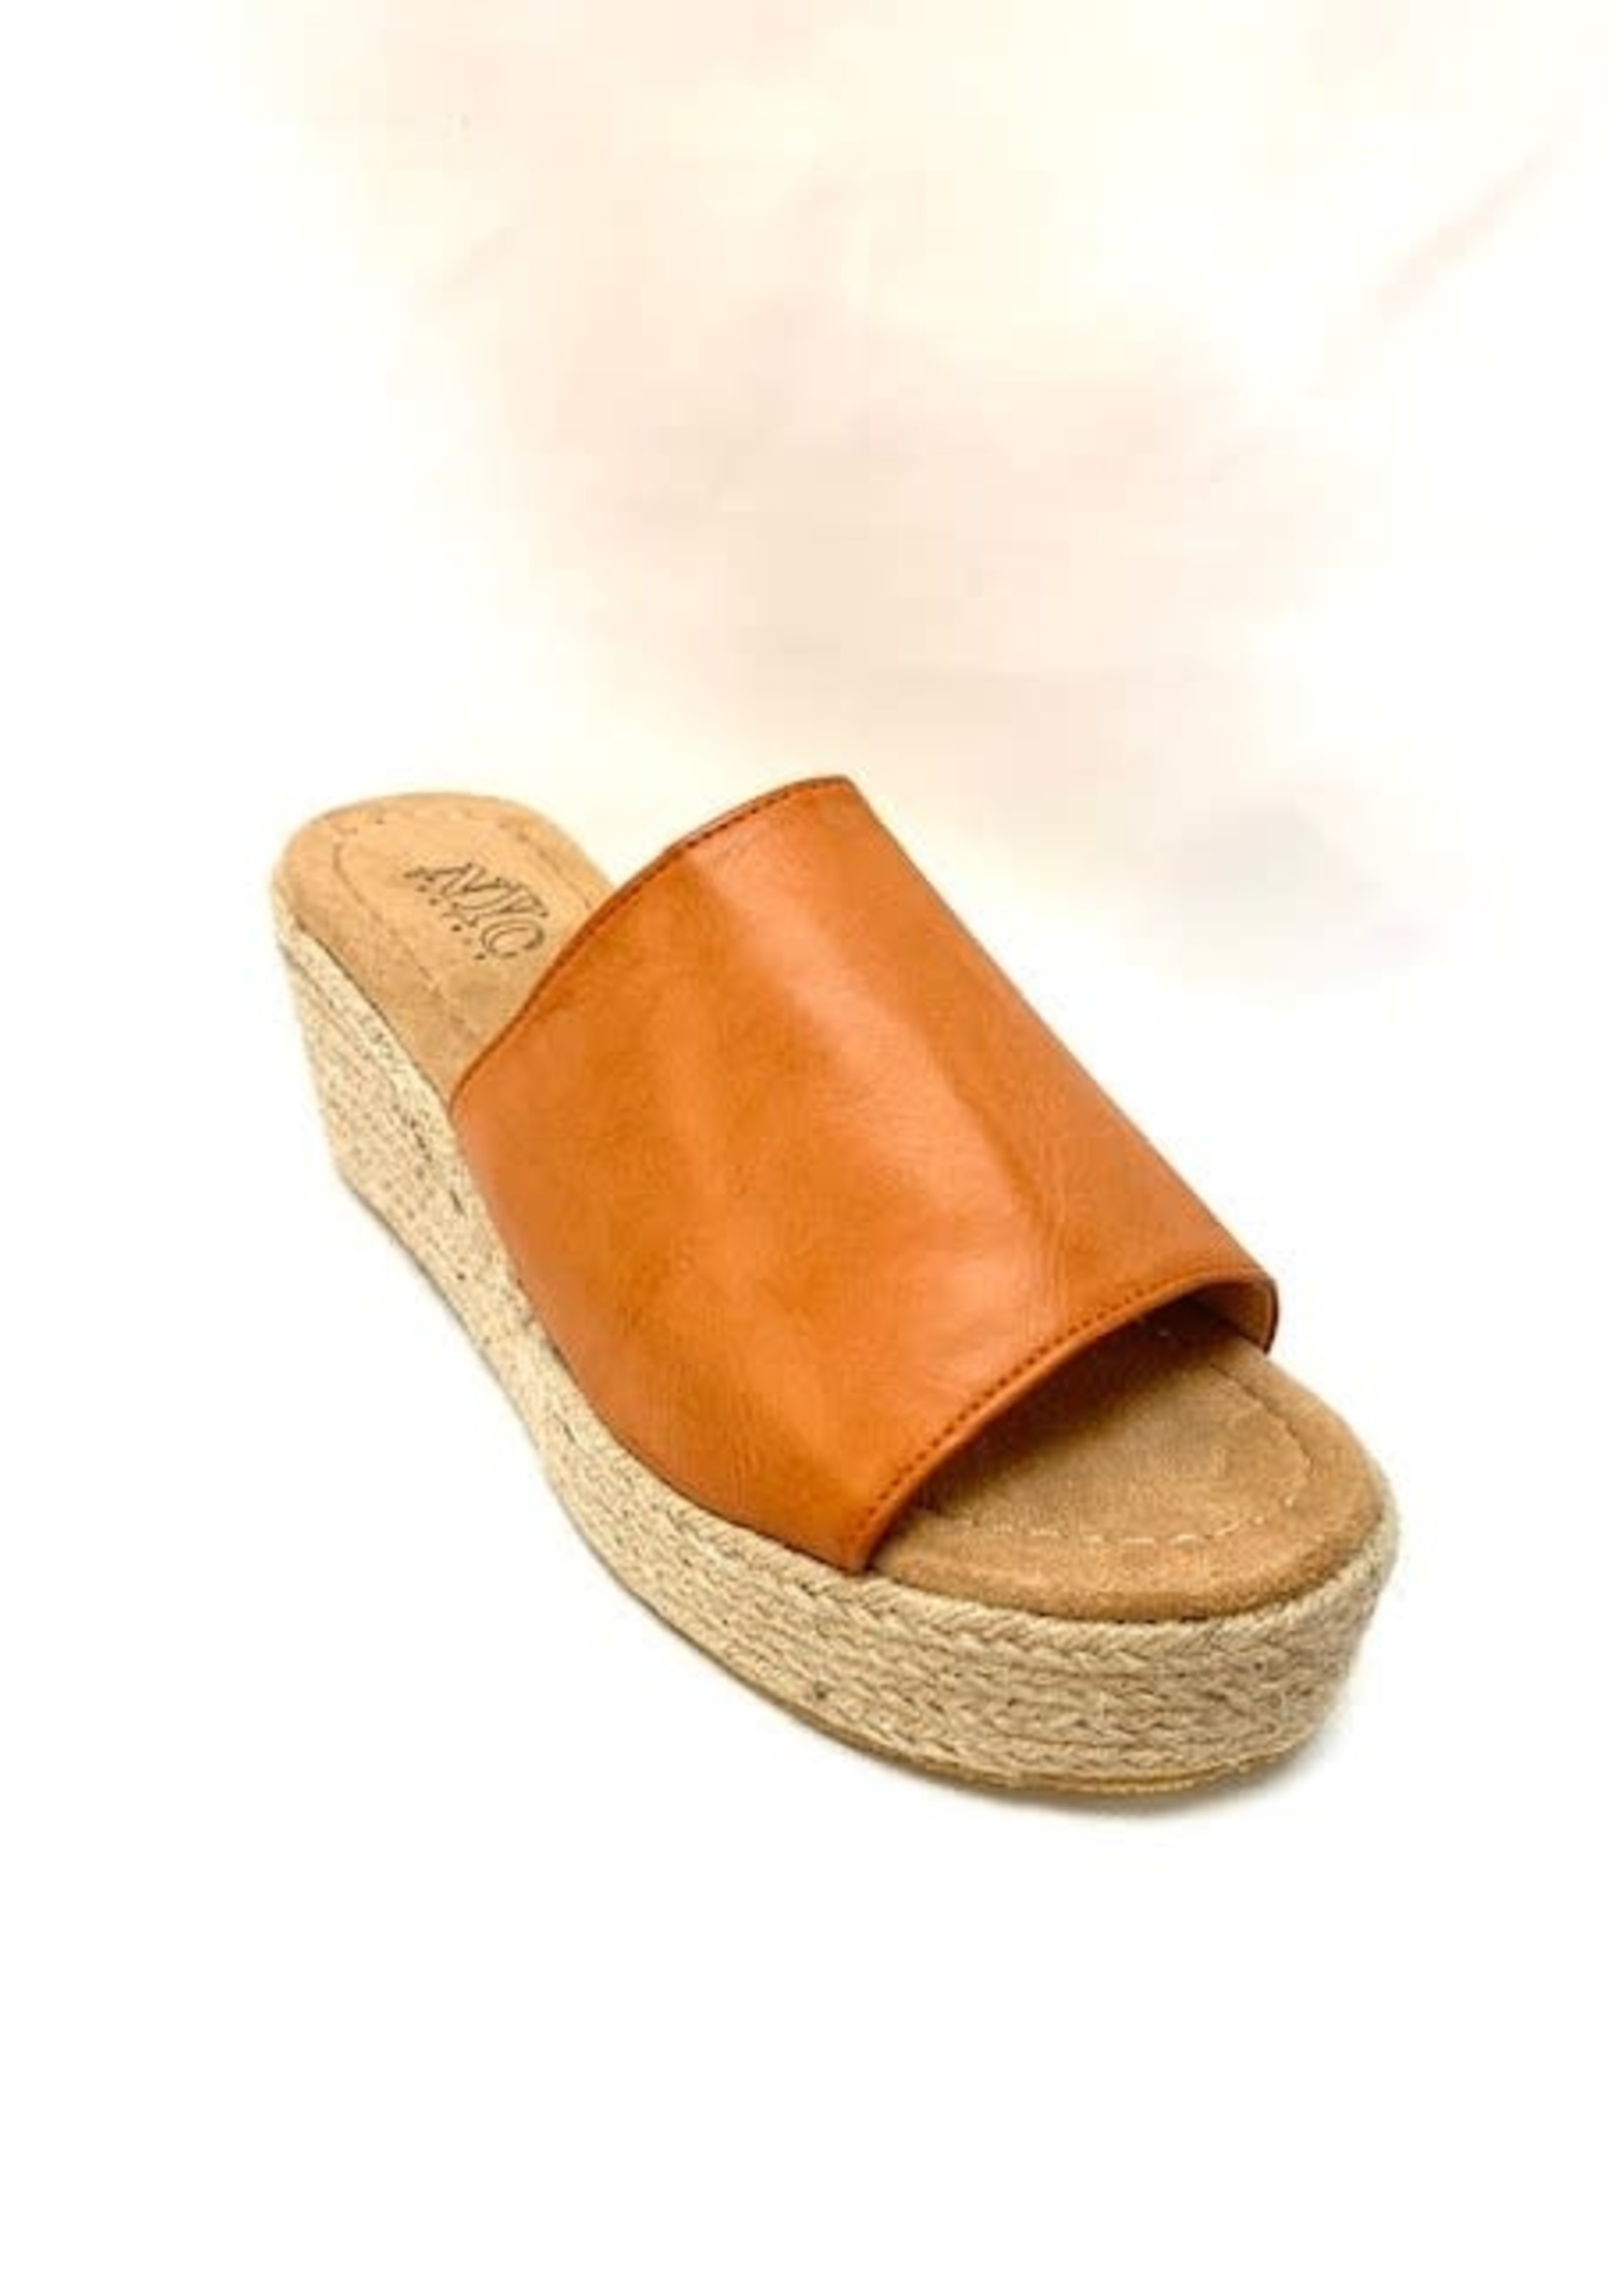 Cyc Wedge sandal